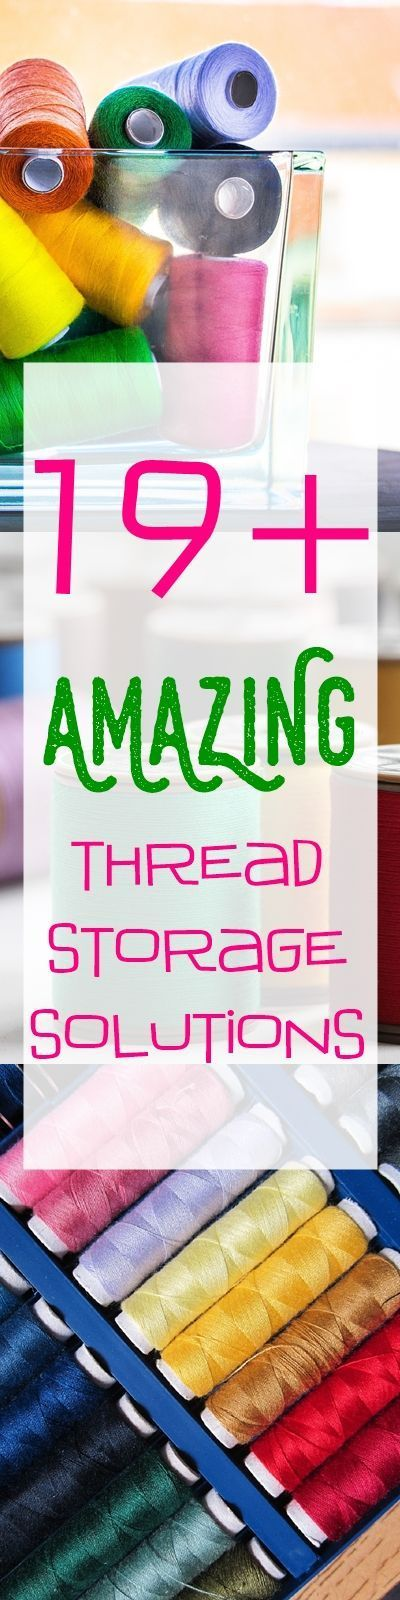 sewing room storage   thread organization   thread storage